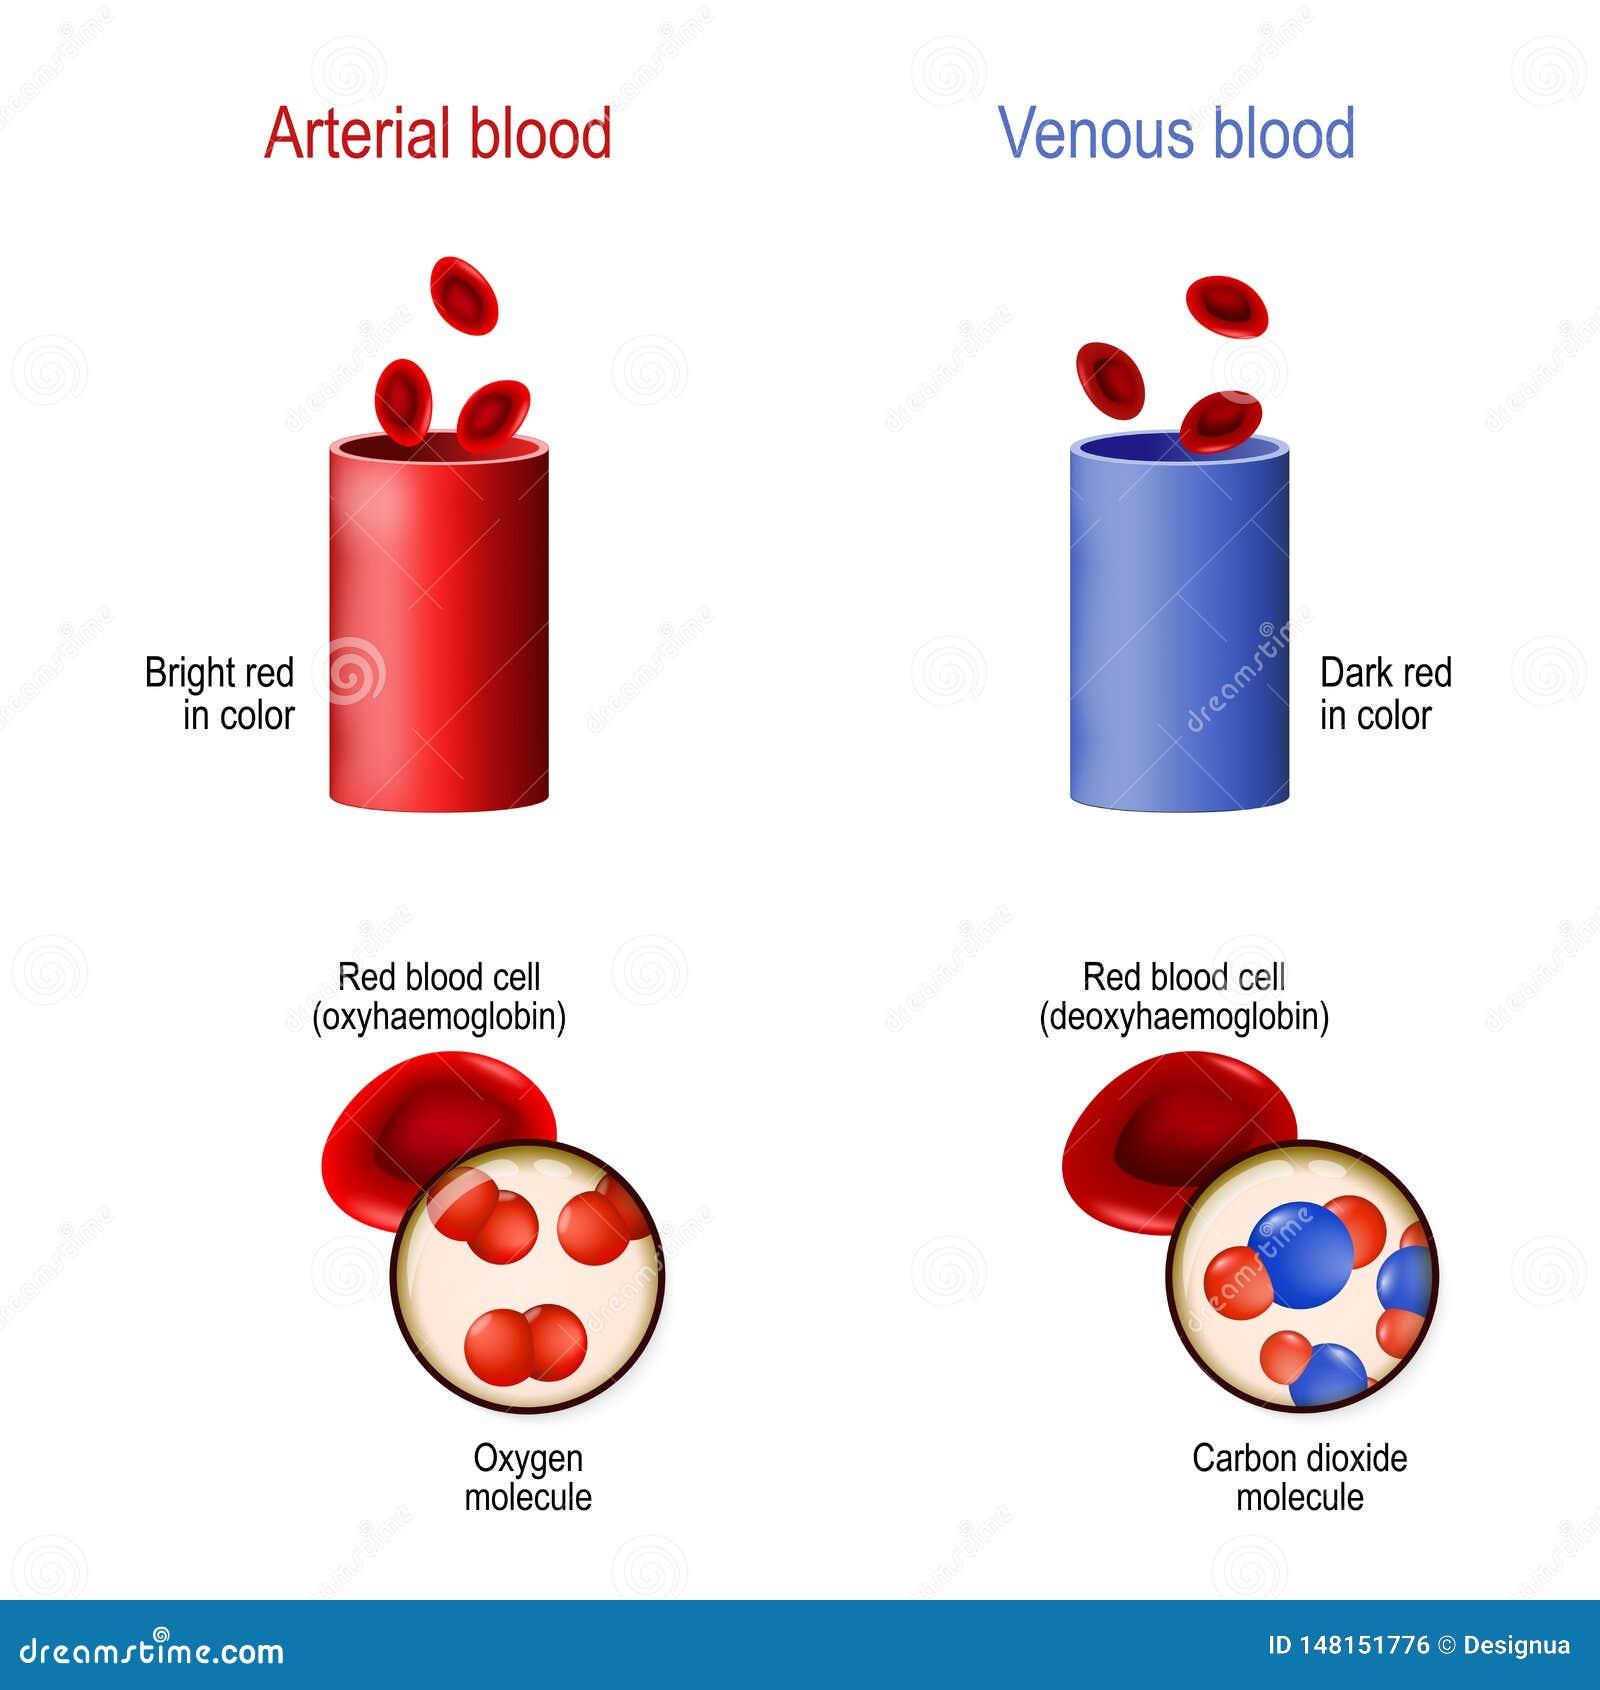 color de la sangre venosa